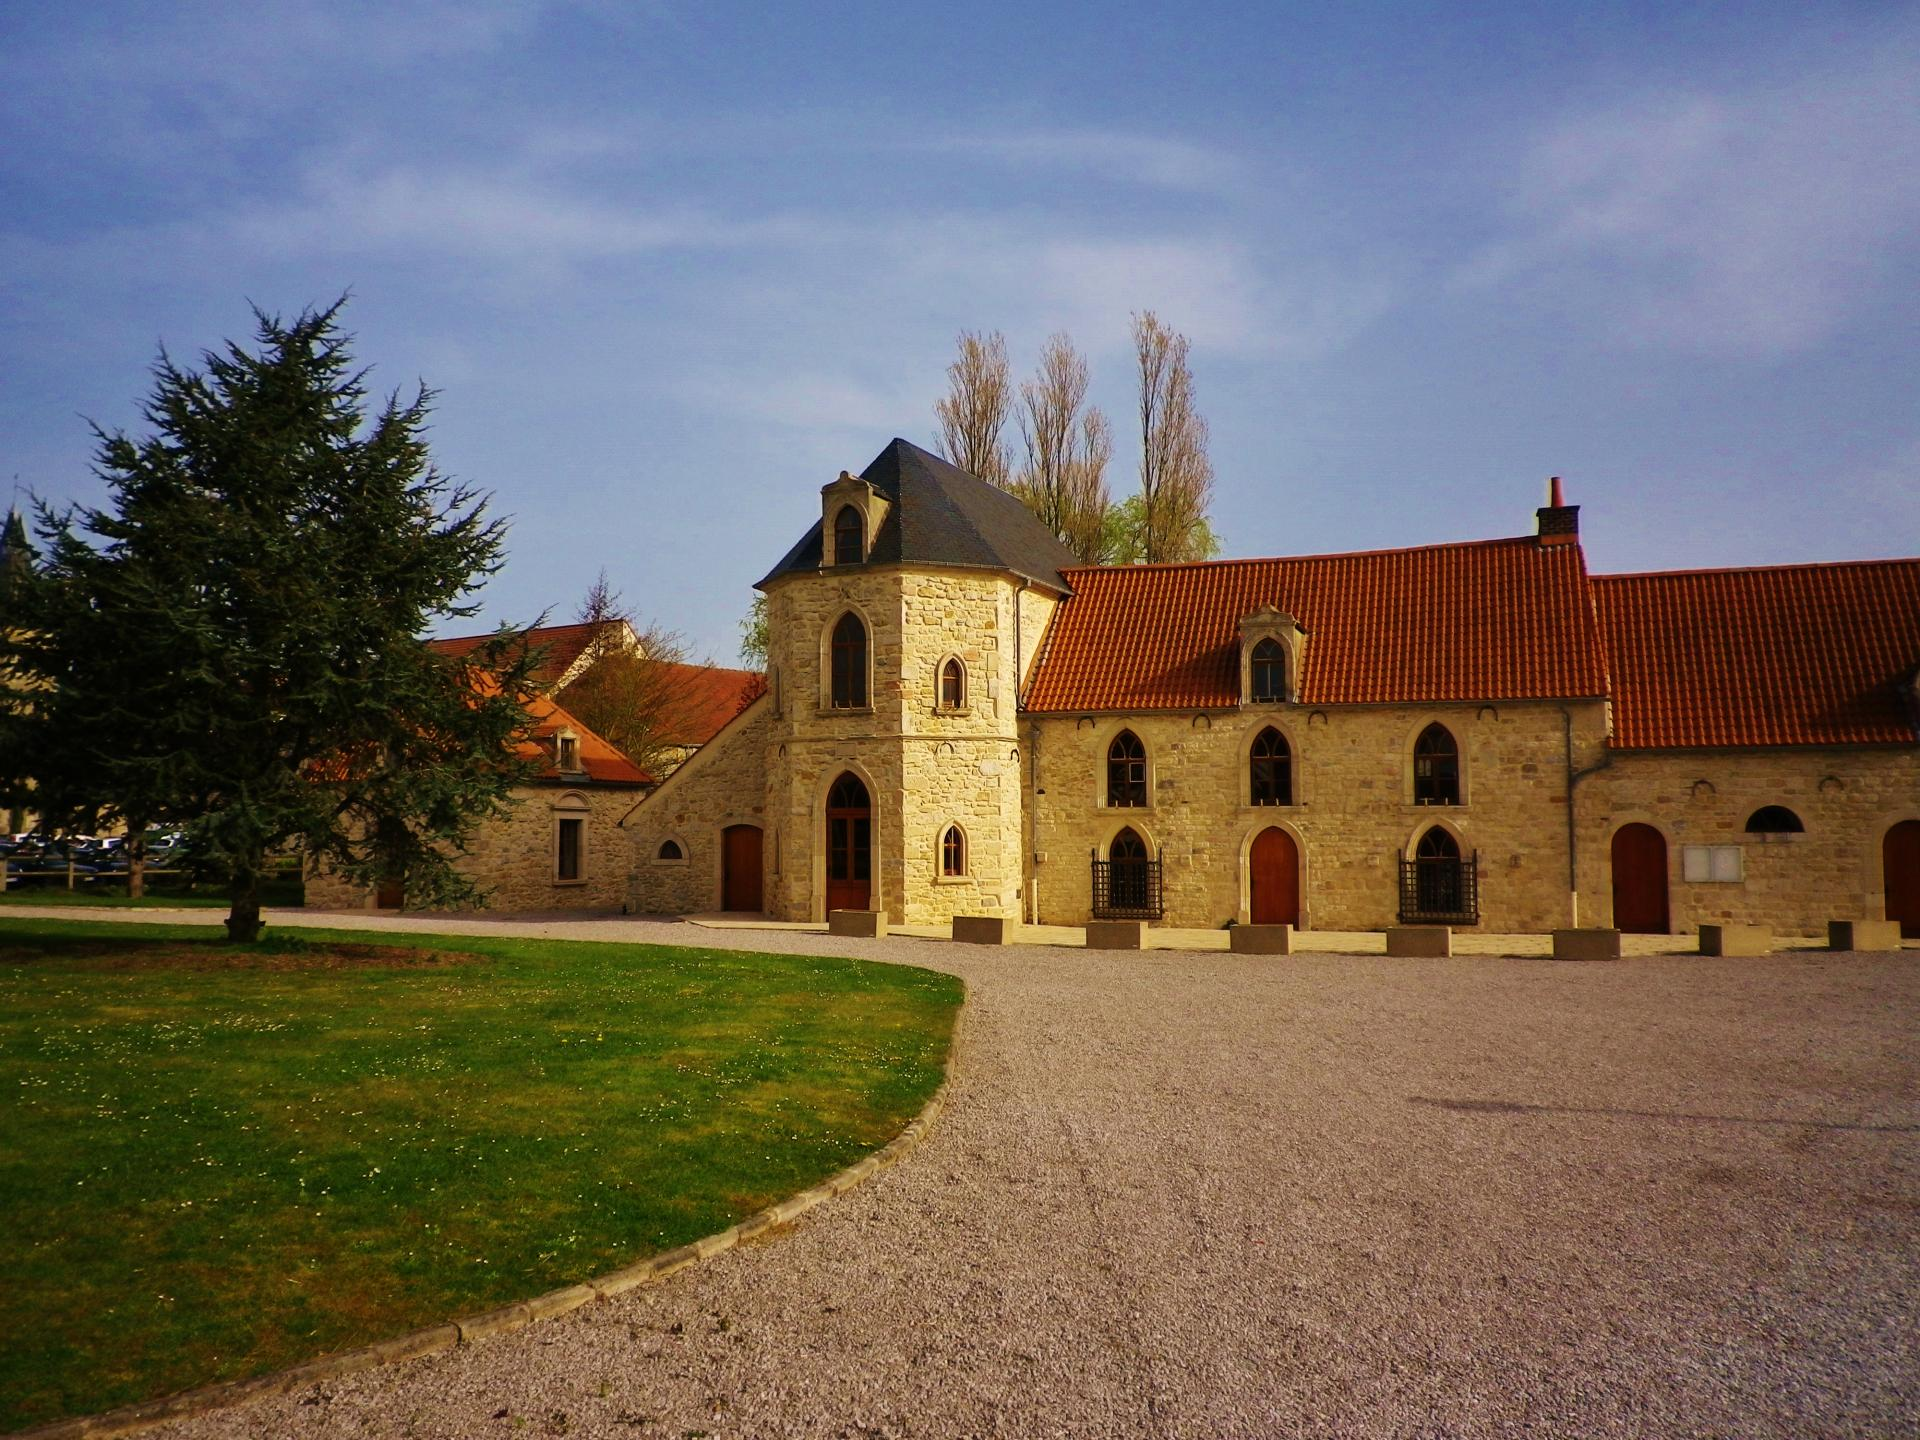 Marquise le château Mollack